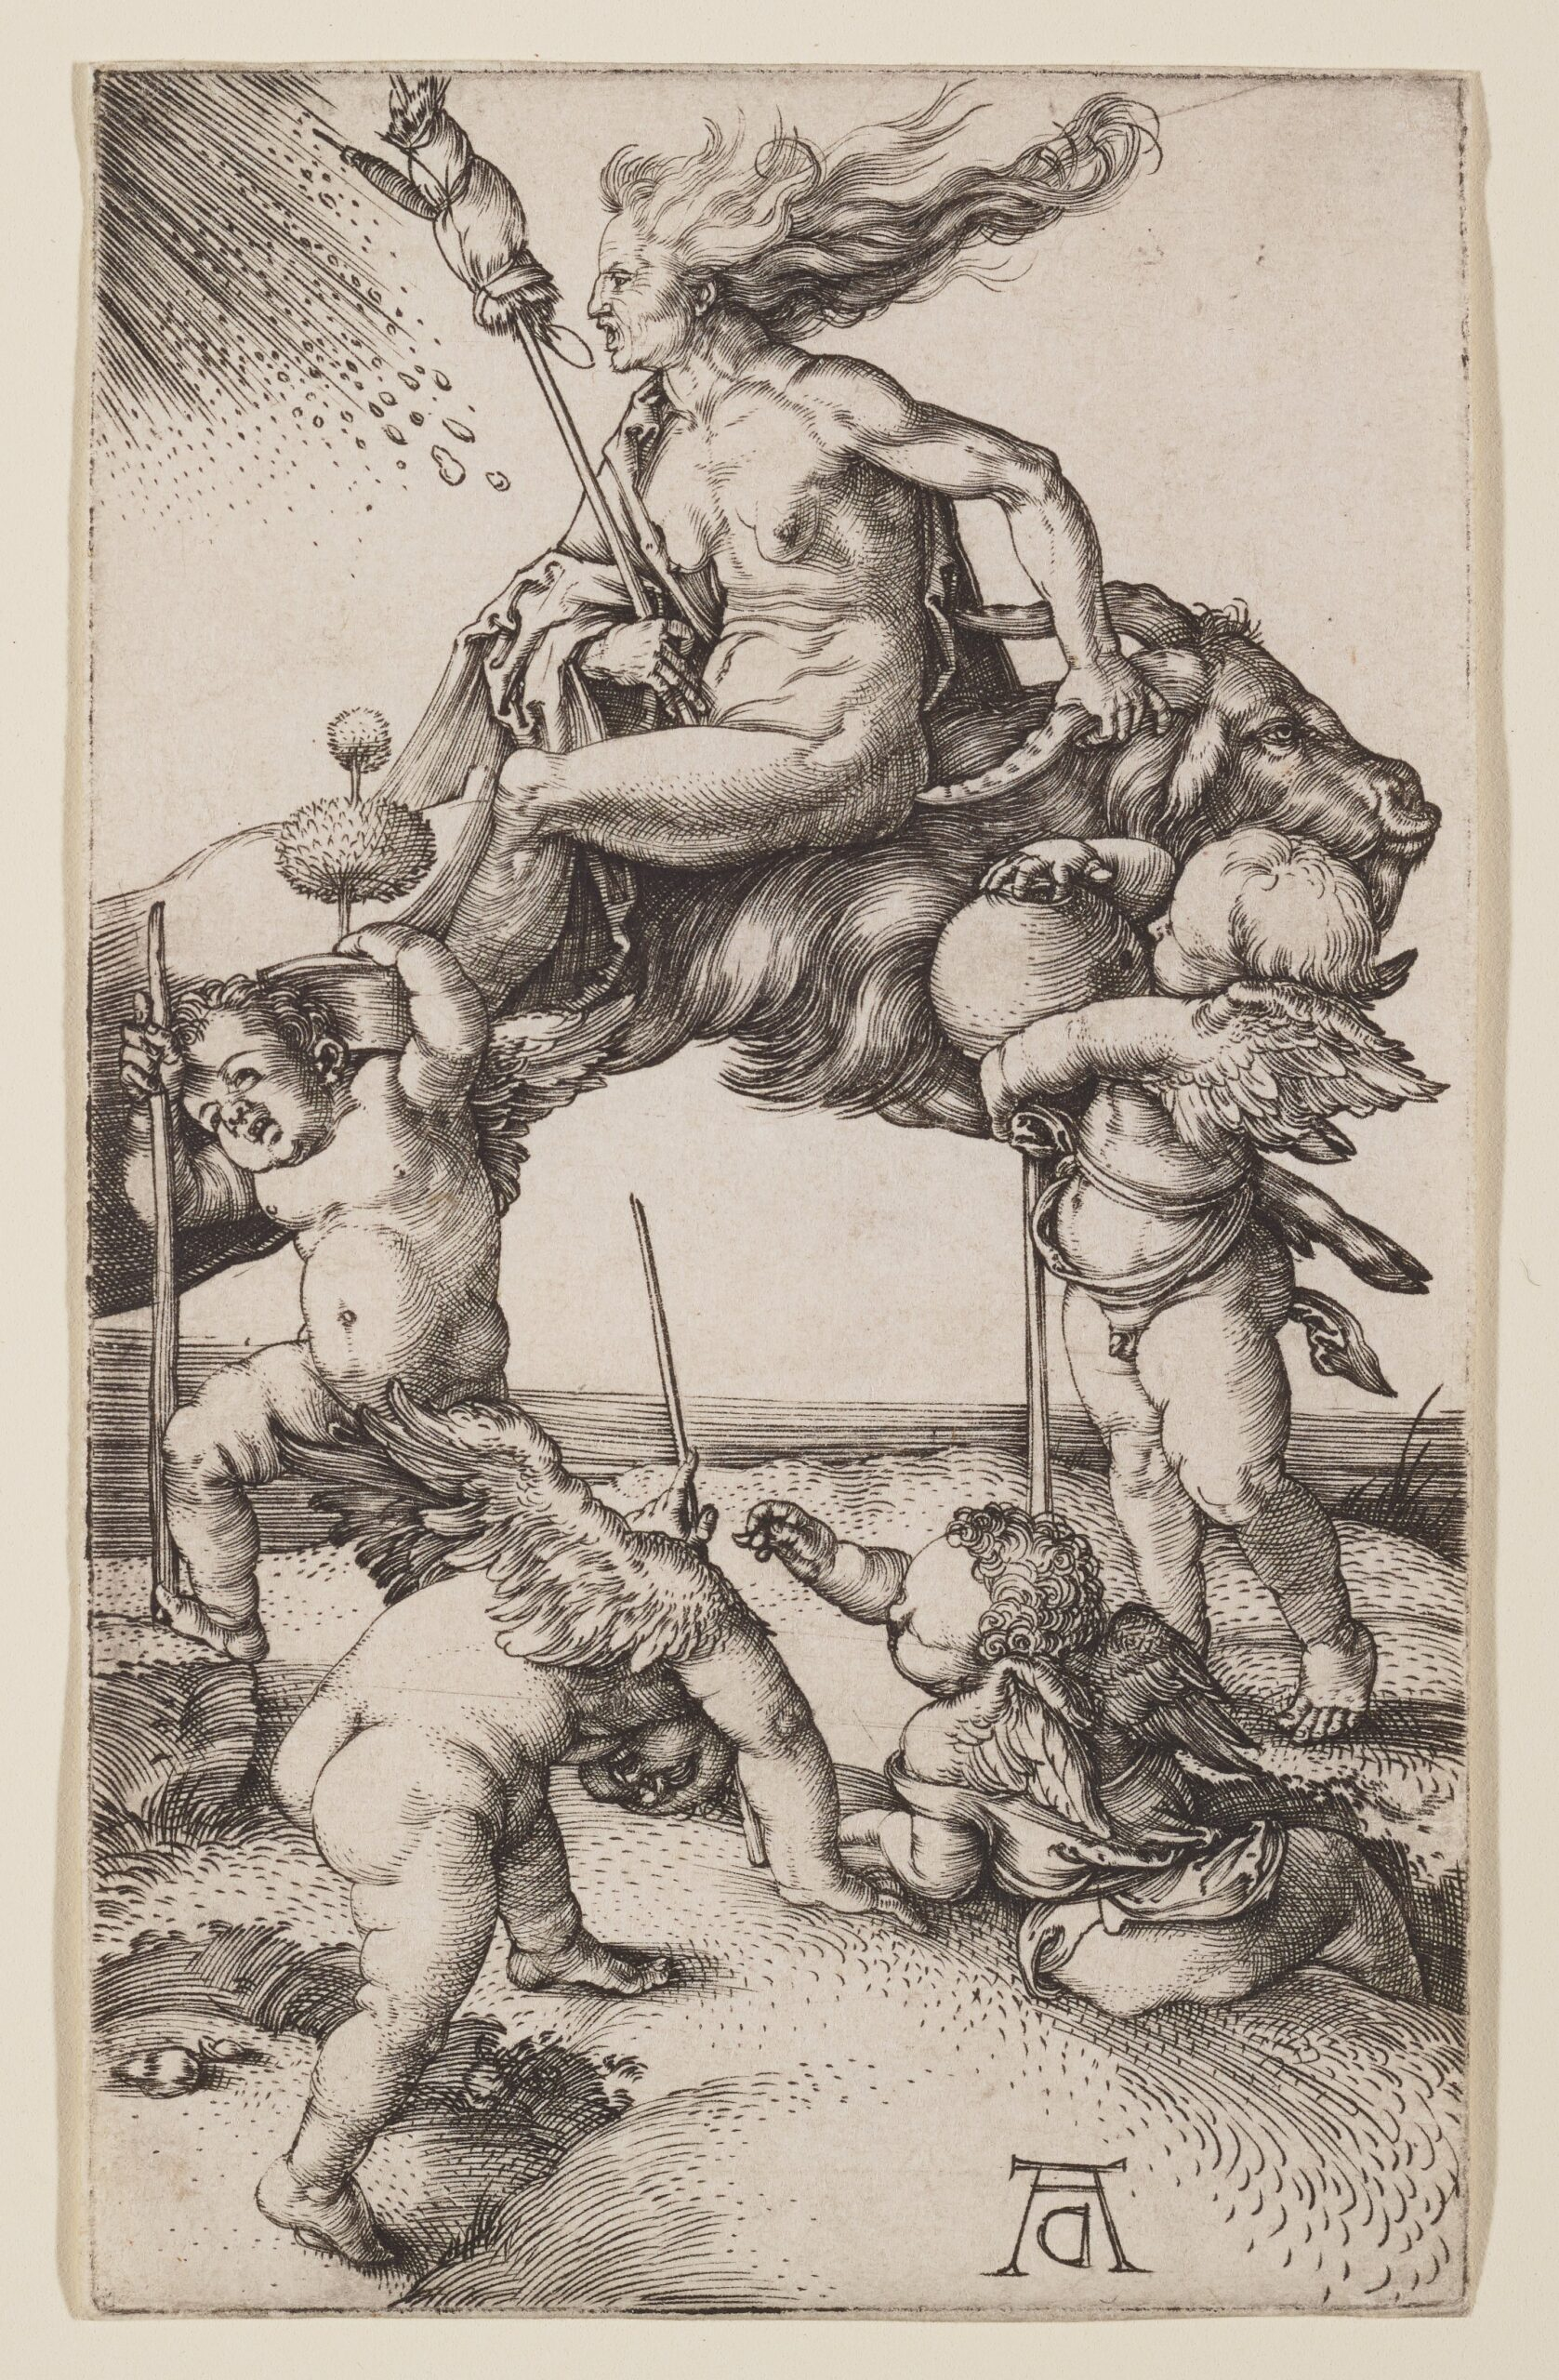 Durer 1500 witch-riding-backwards-on-a-goat